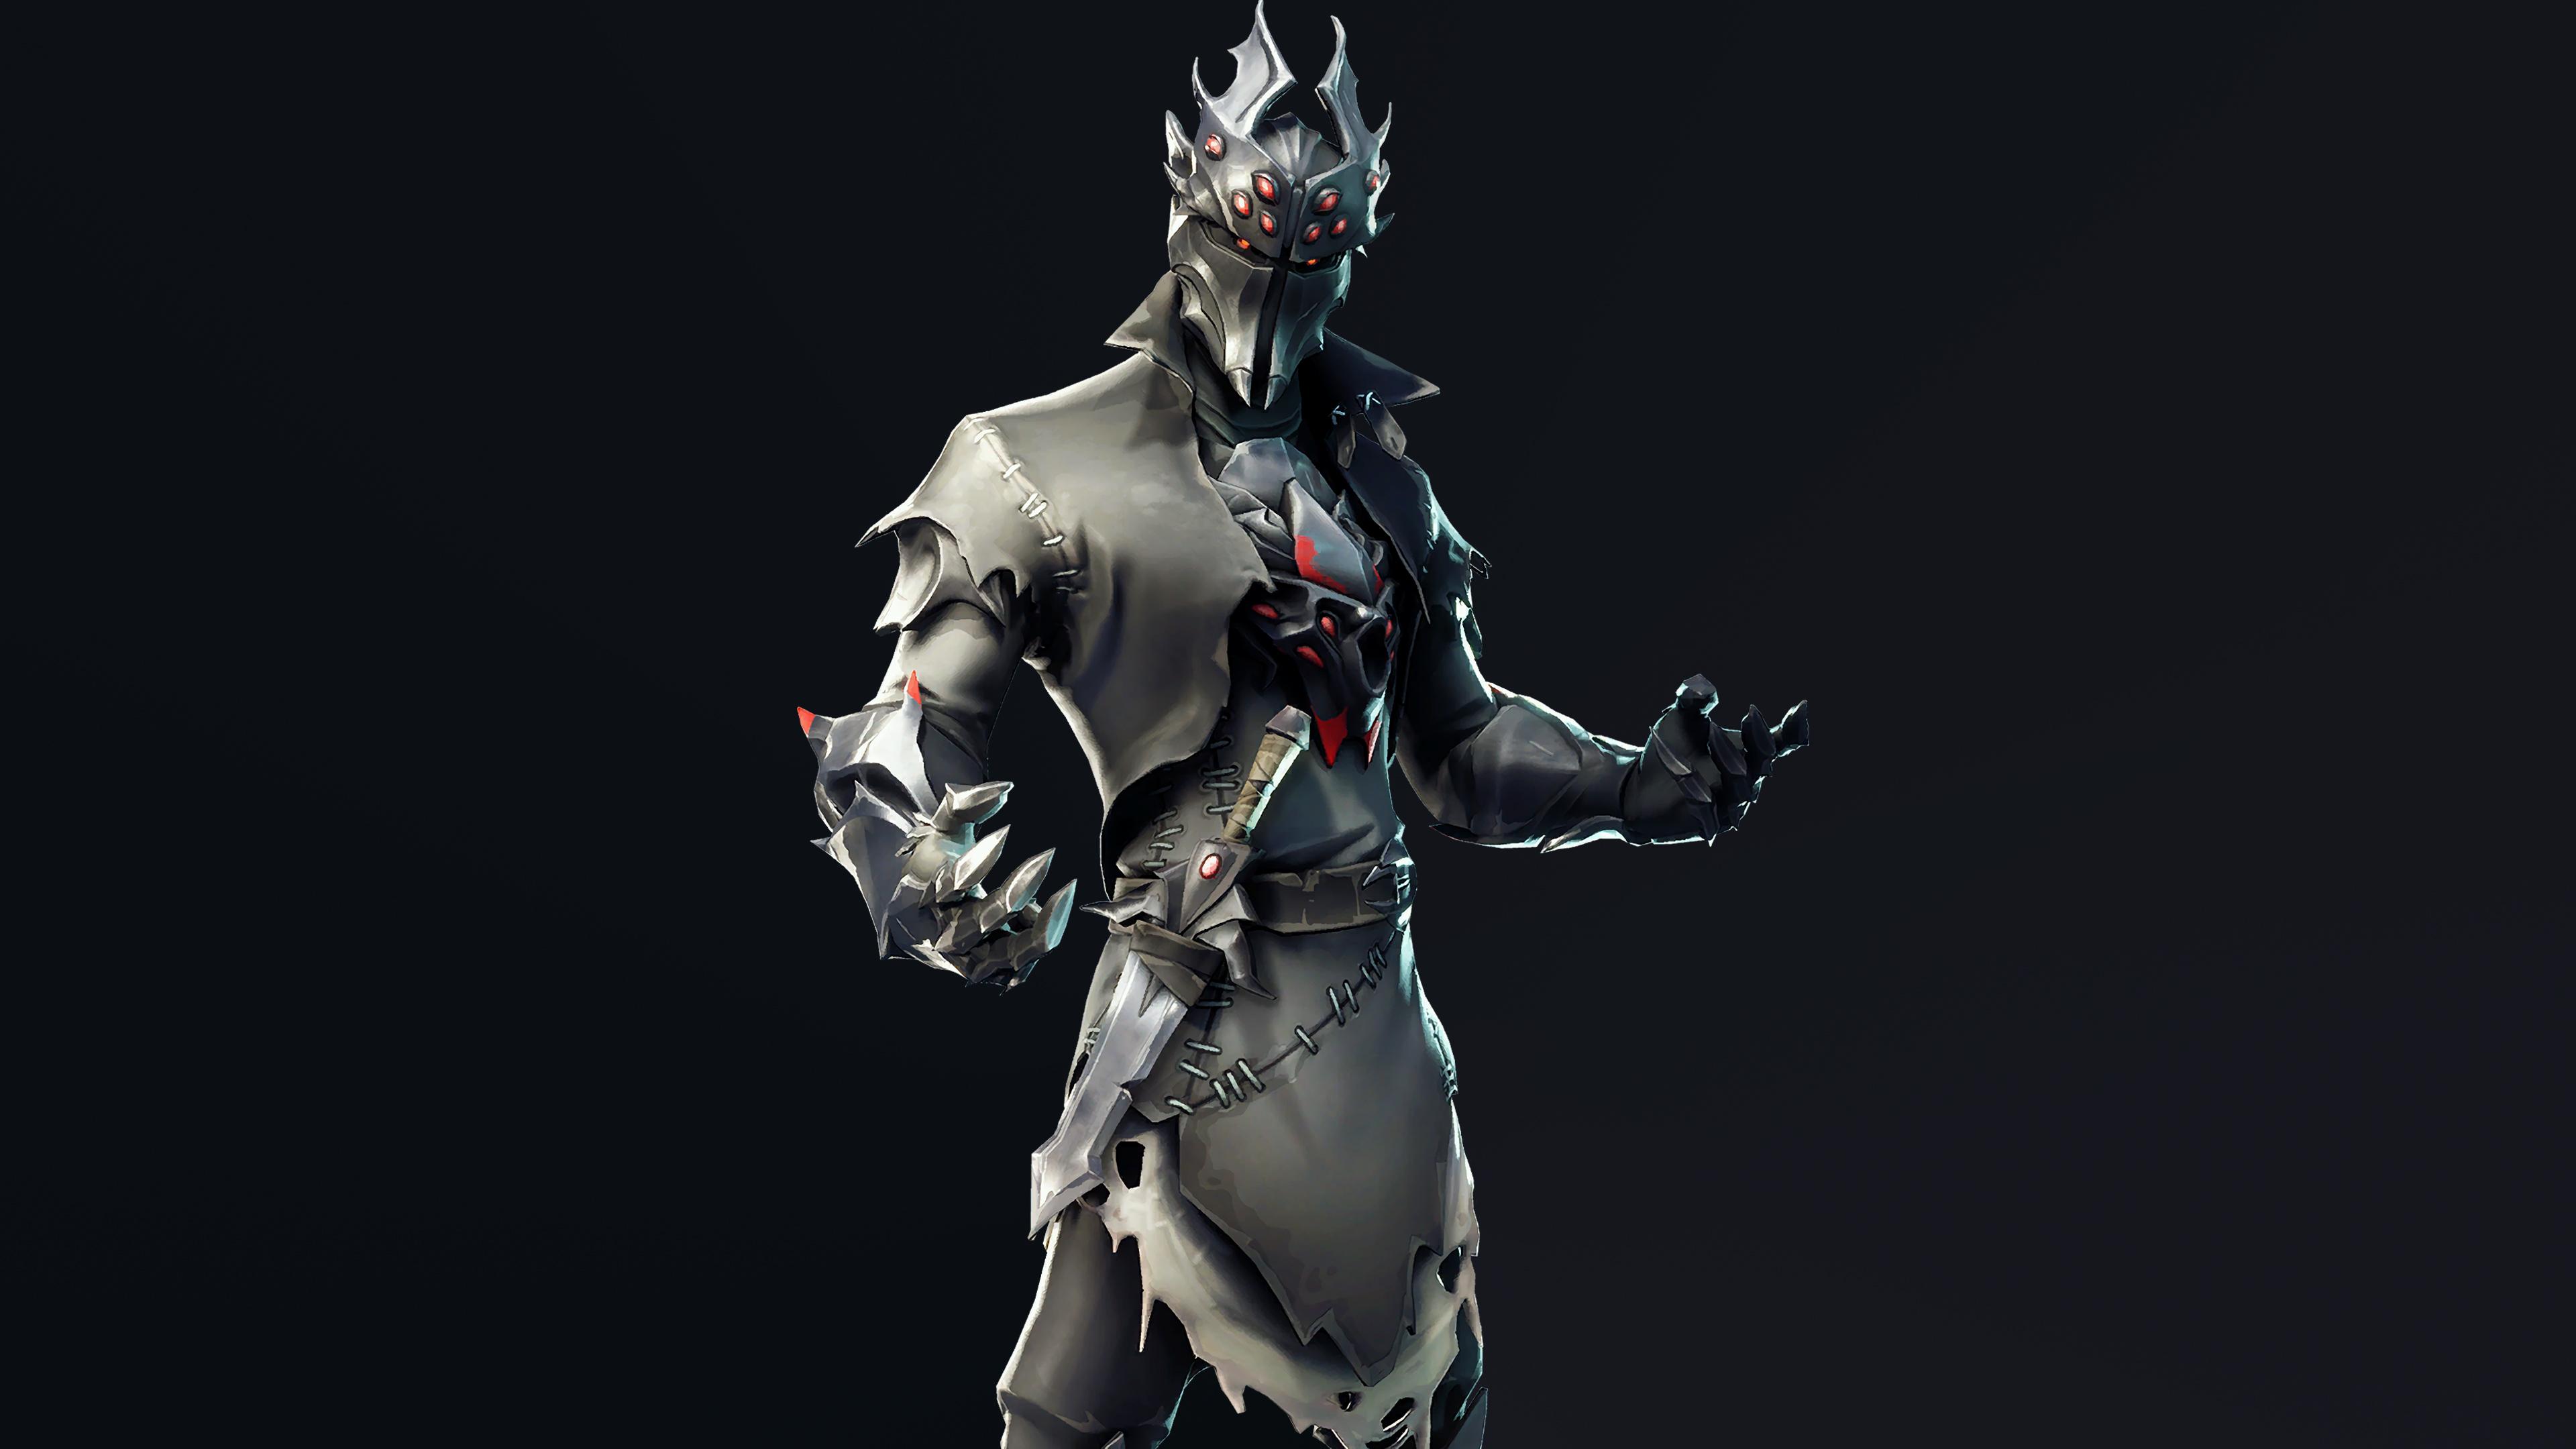 Skins Cool Fortnite Background